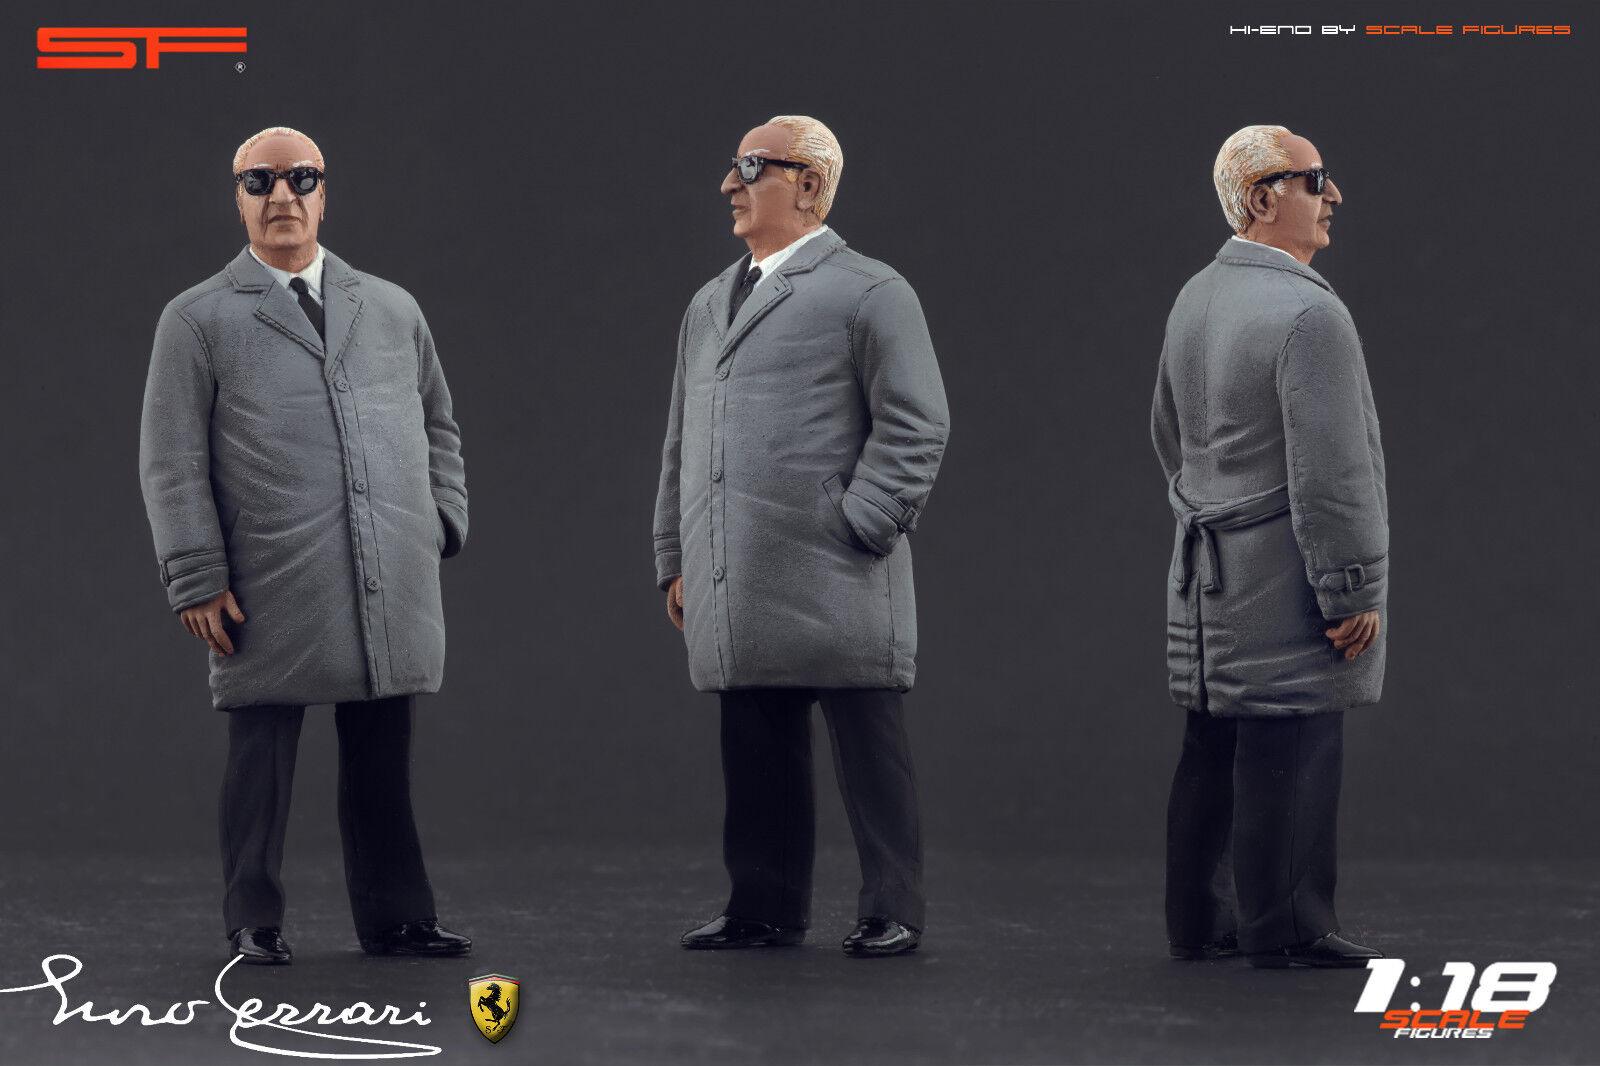 1 18 Enzo Ferrari in grey cloak VERY RARE    figurine NO CARS    for diecast car